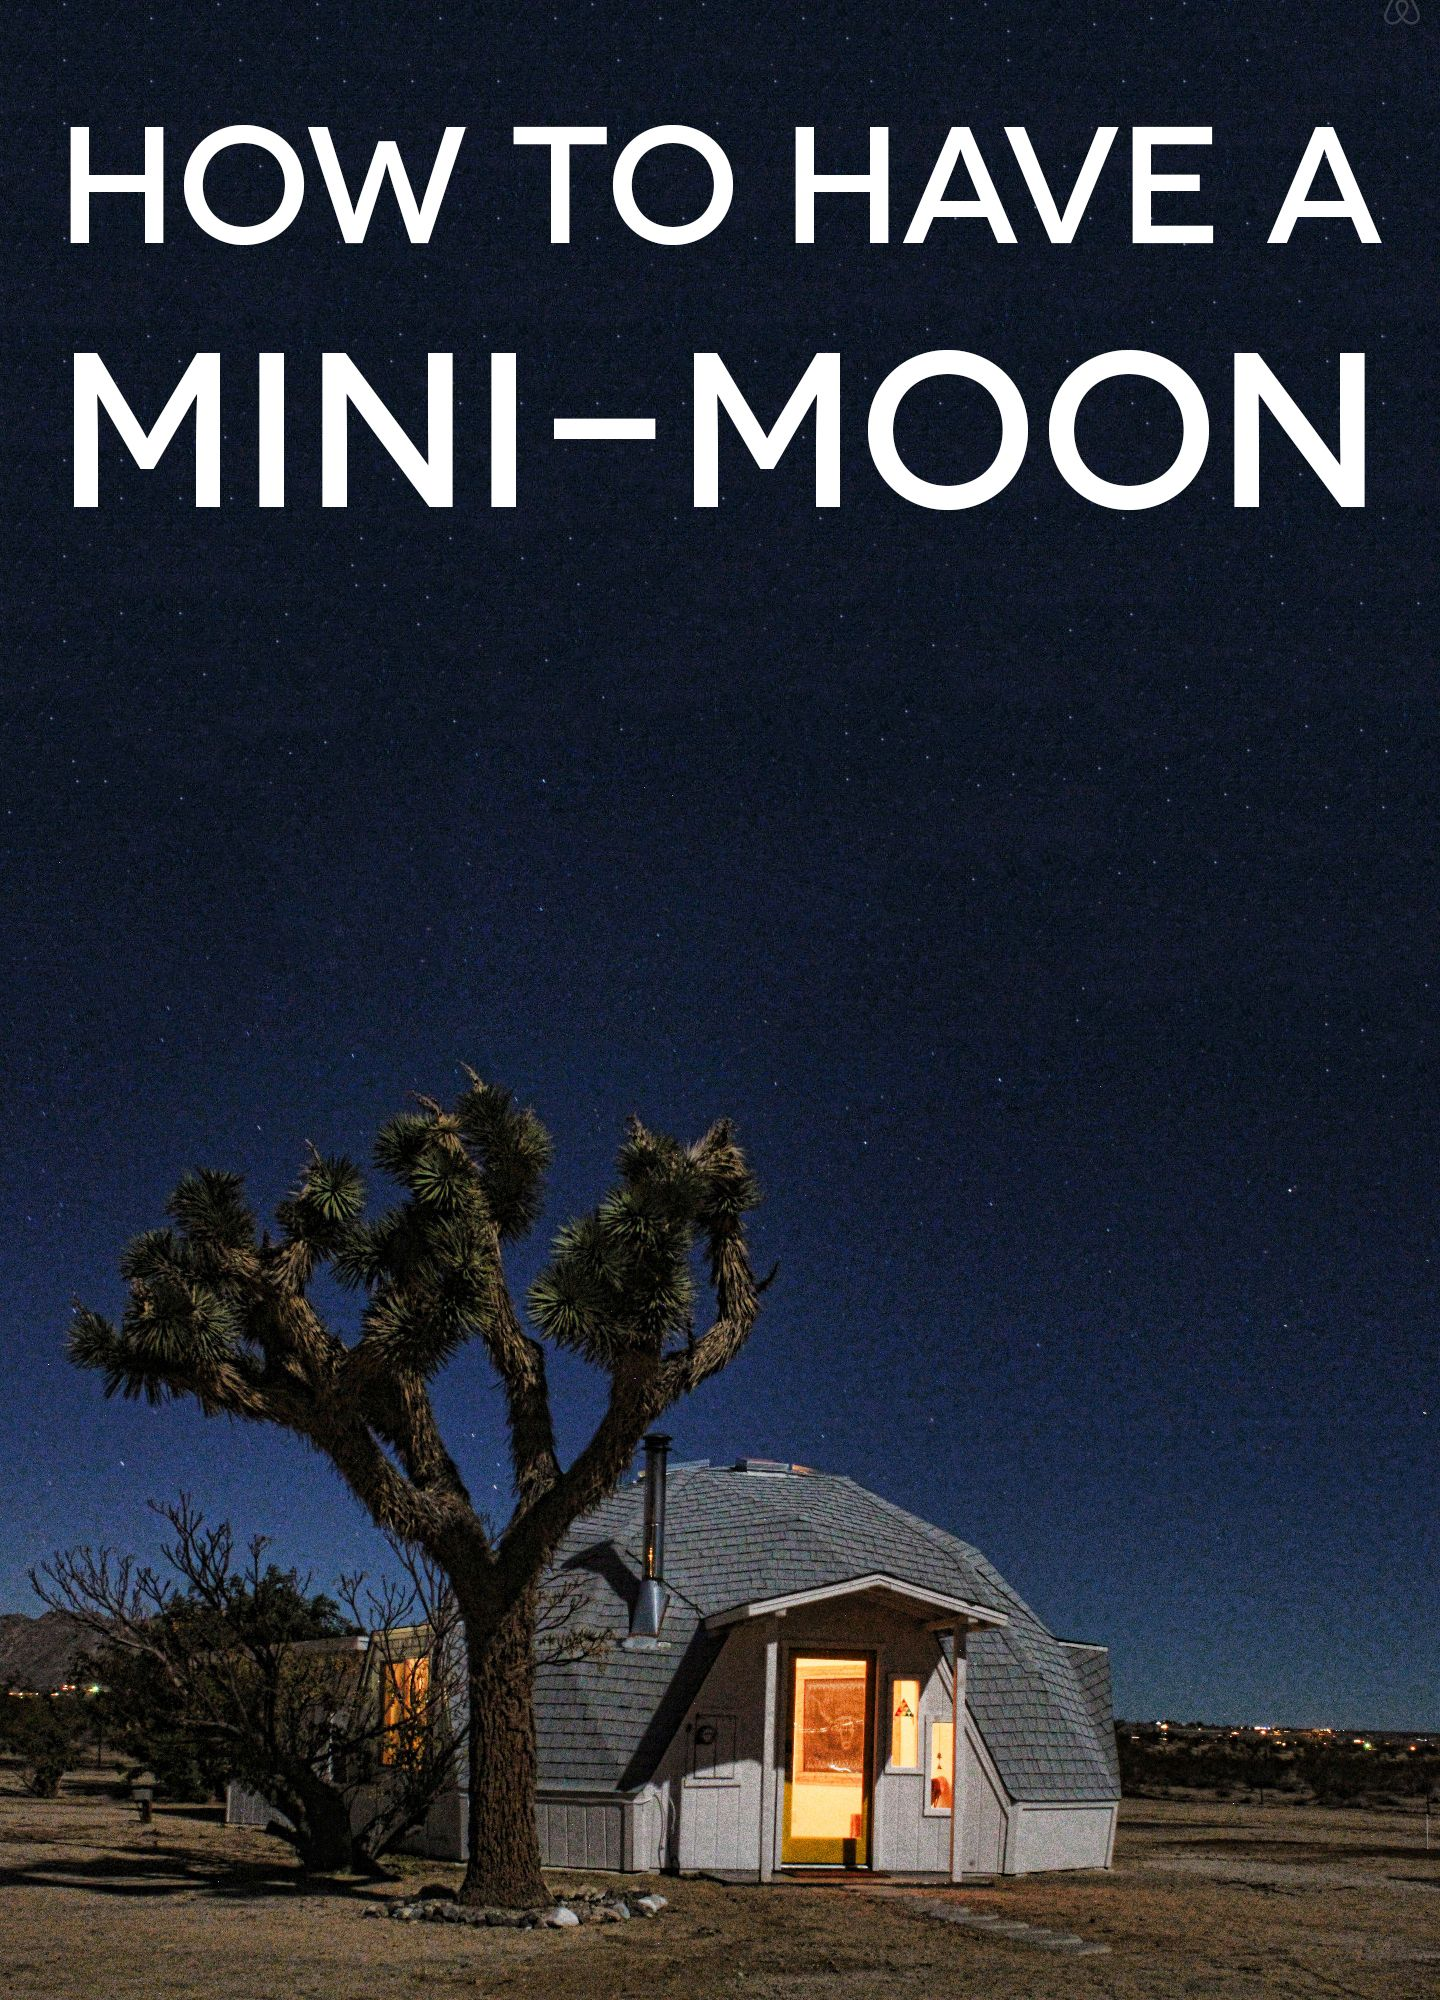 Mini Moon, Mini Moon Ideas, Mini